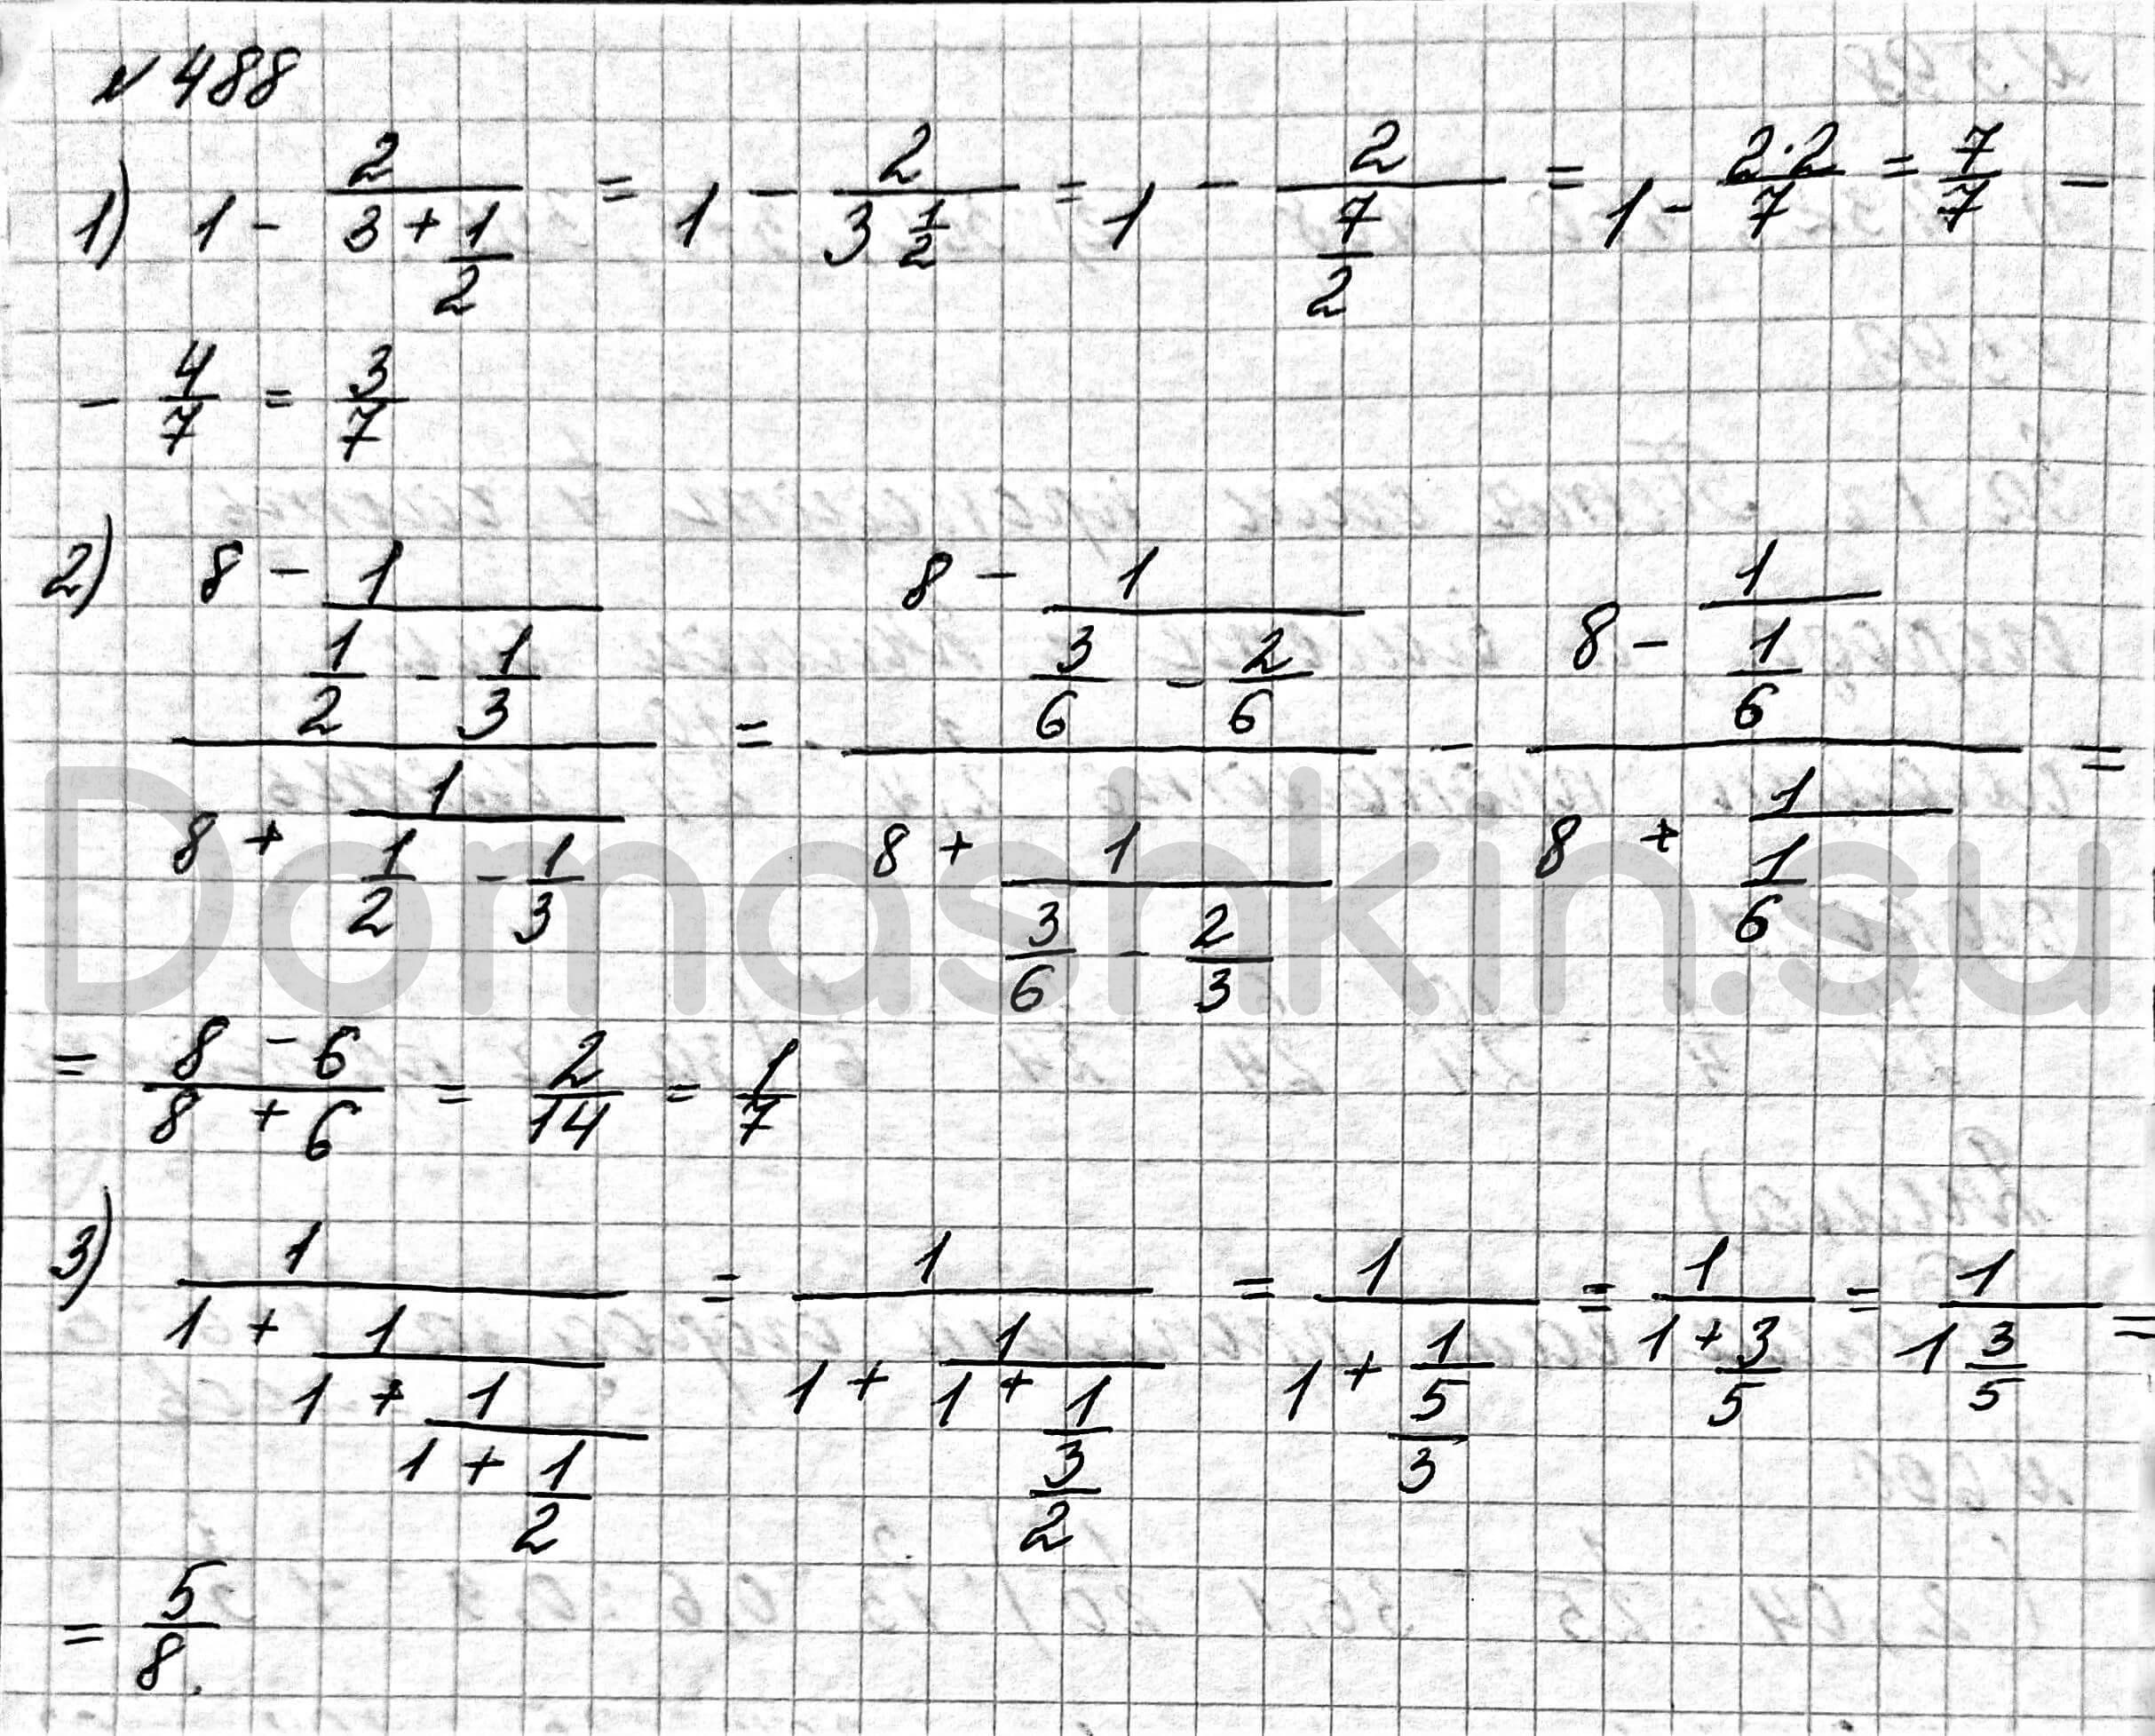 Математика 6 класс учебник Мерзляк номер 488 решение